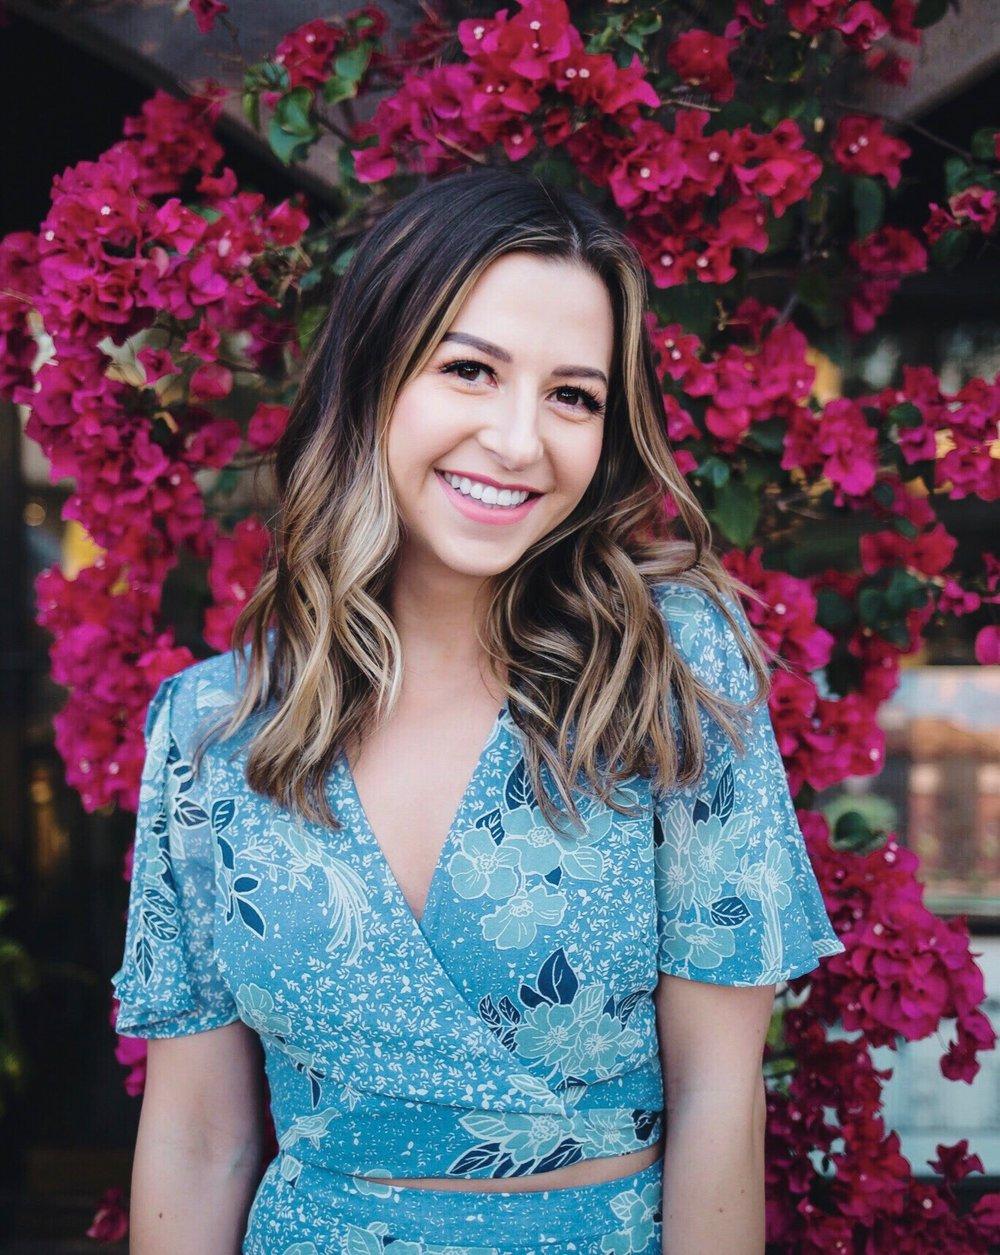 Becca Booker - Guest on Episode 15 of The Burnout-Proof Your Biz Podcast with Chelsea B Foster | www.burnoutproofyourbiz.com